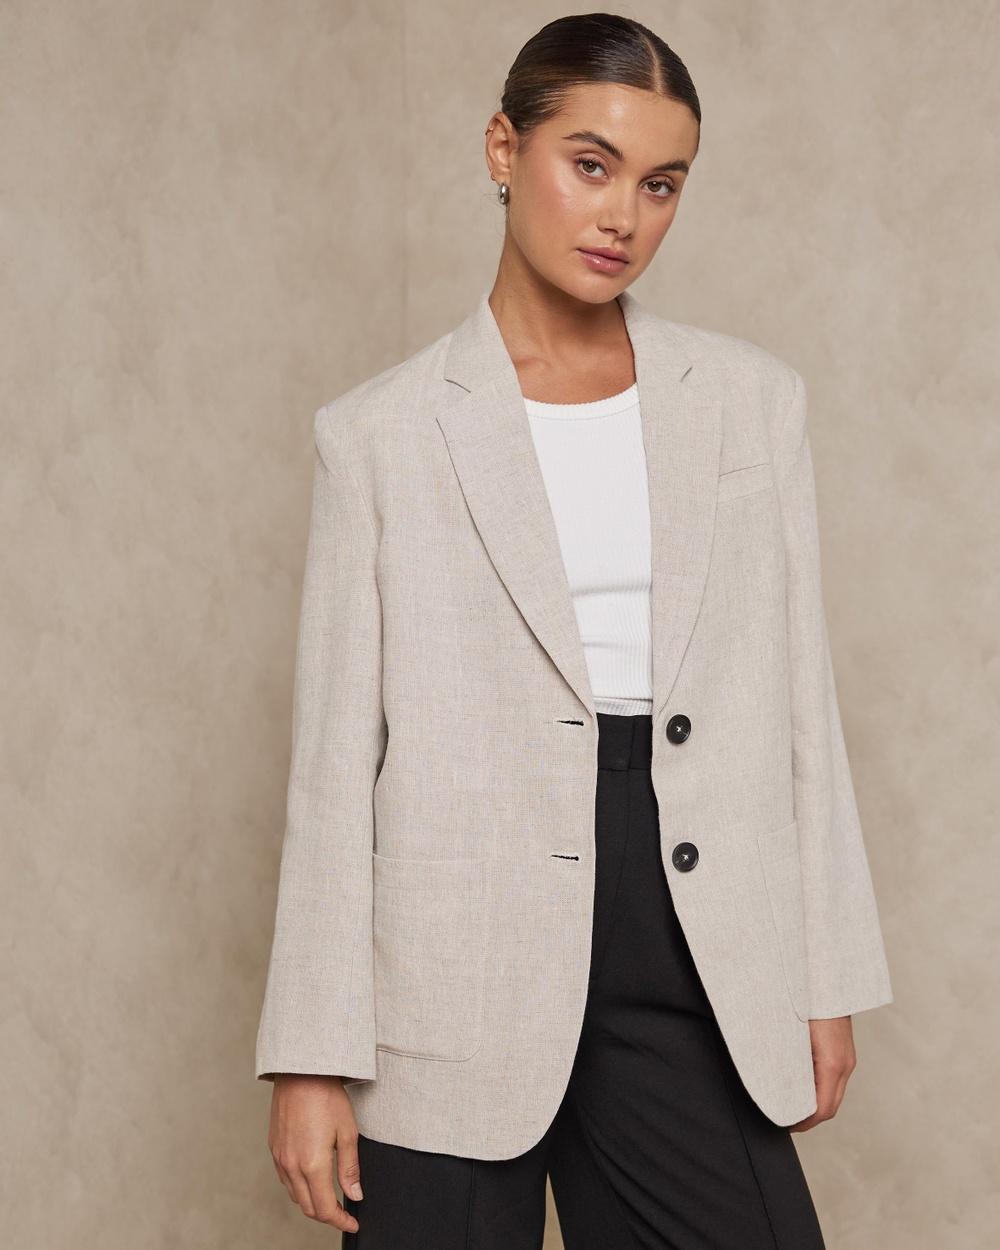 AERE Oversized Linen Blazers Neutral